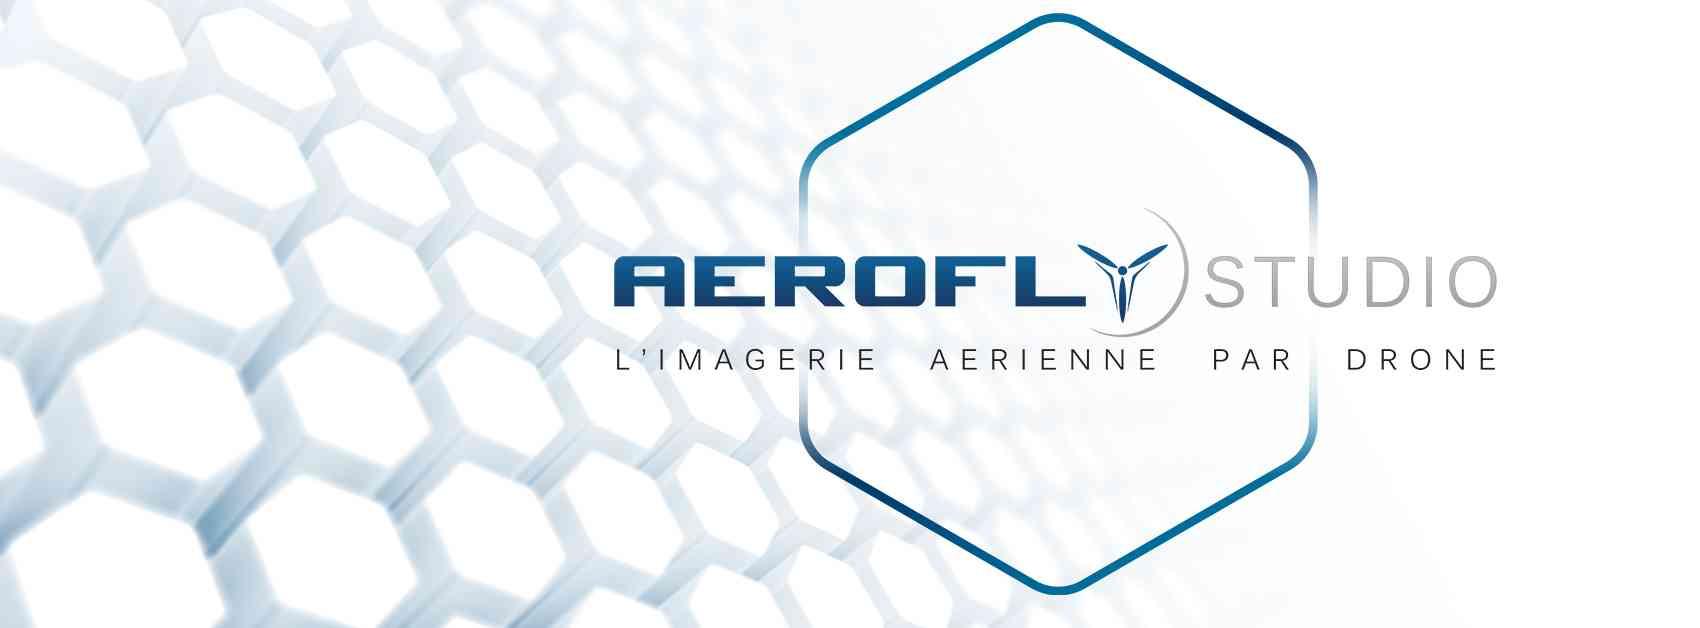 Aérofly Studio | Véretz France | visite virtuelle 360 3D VR